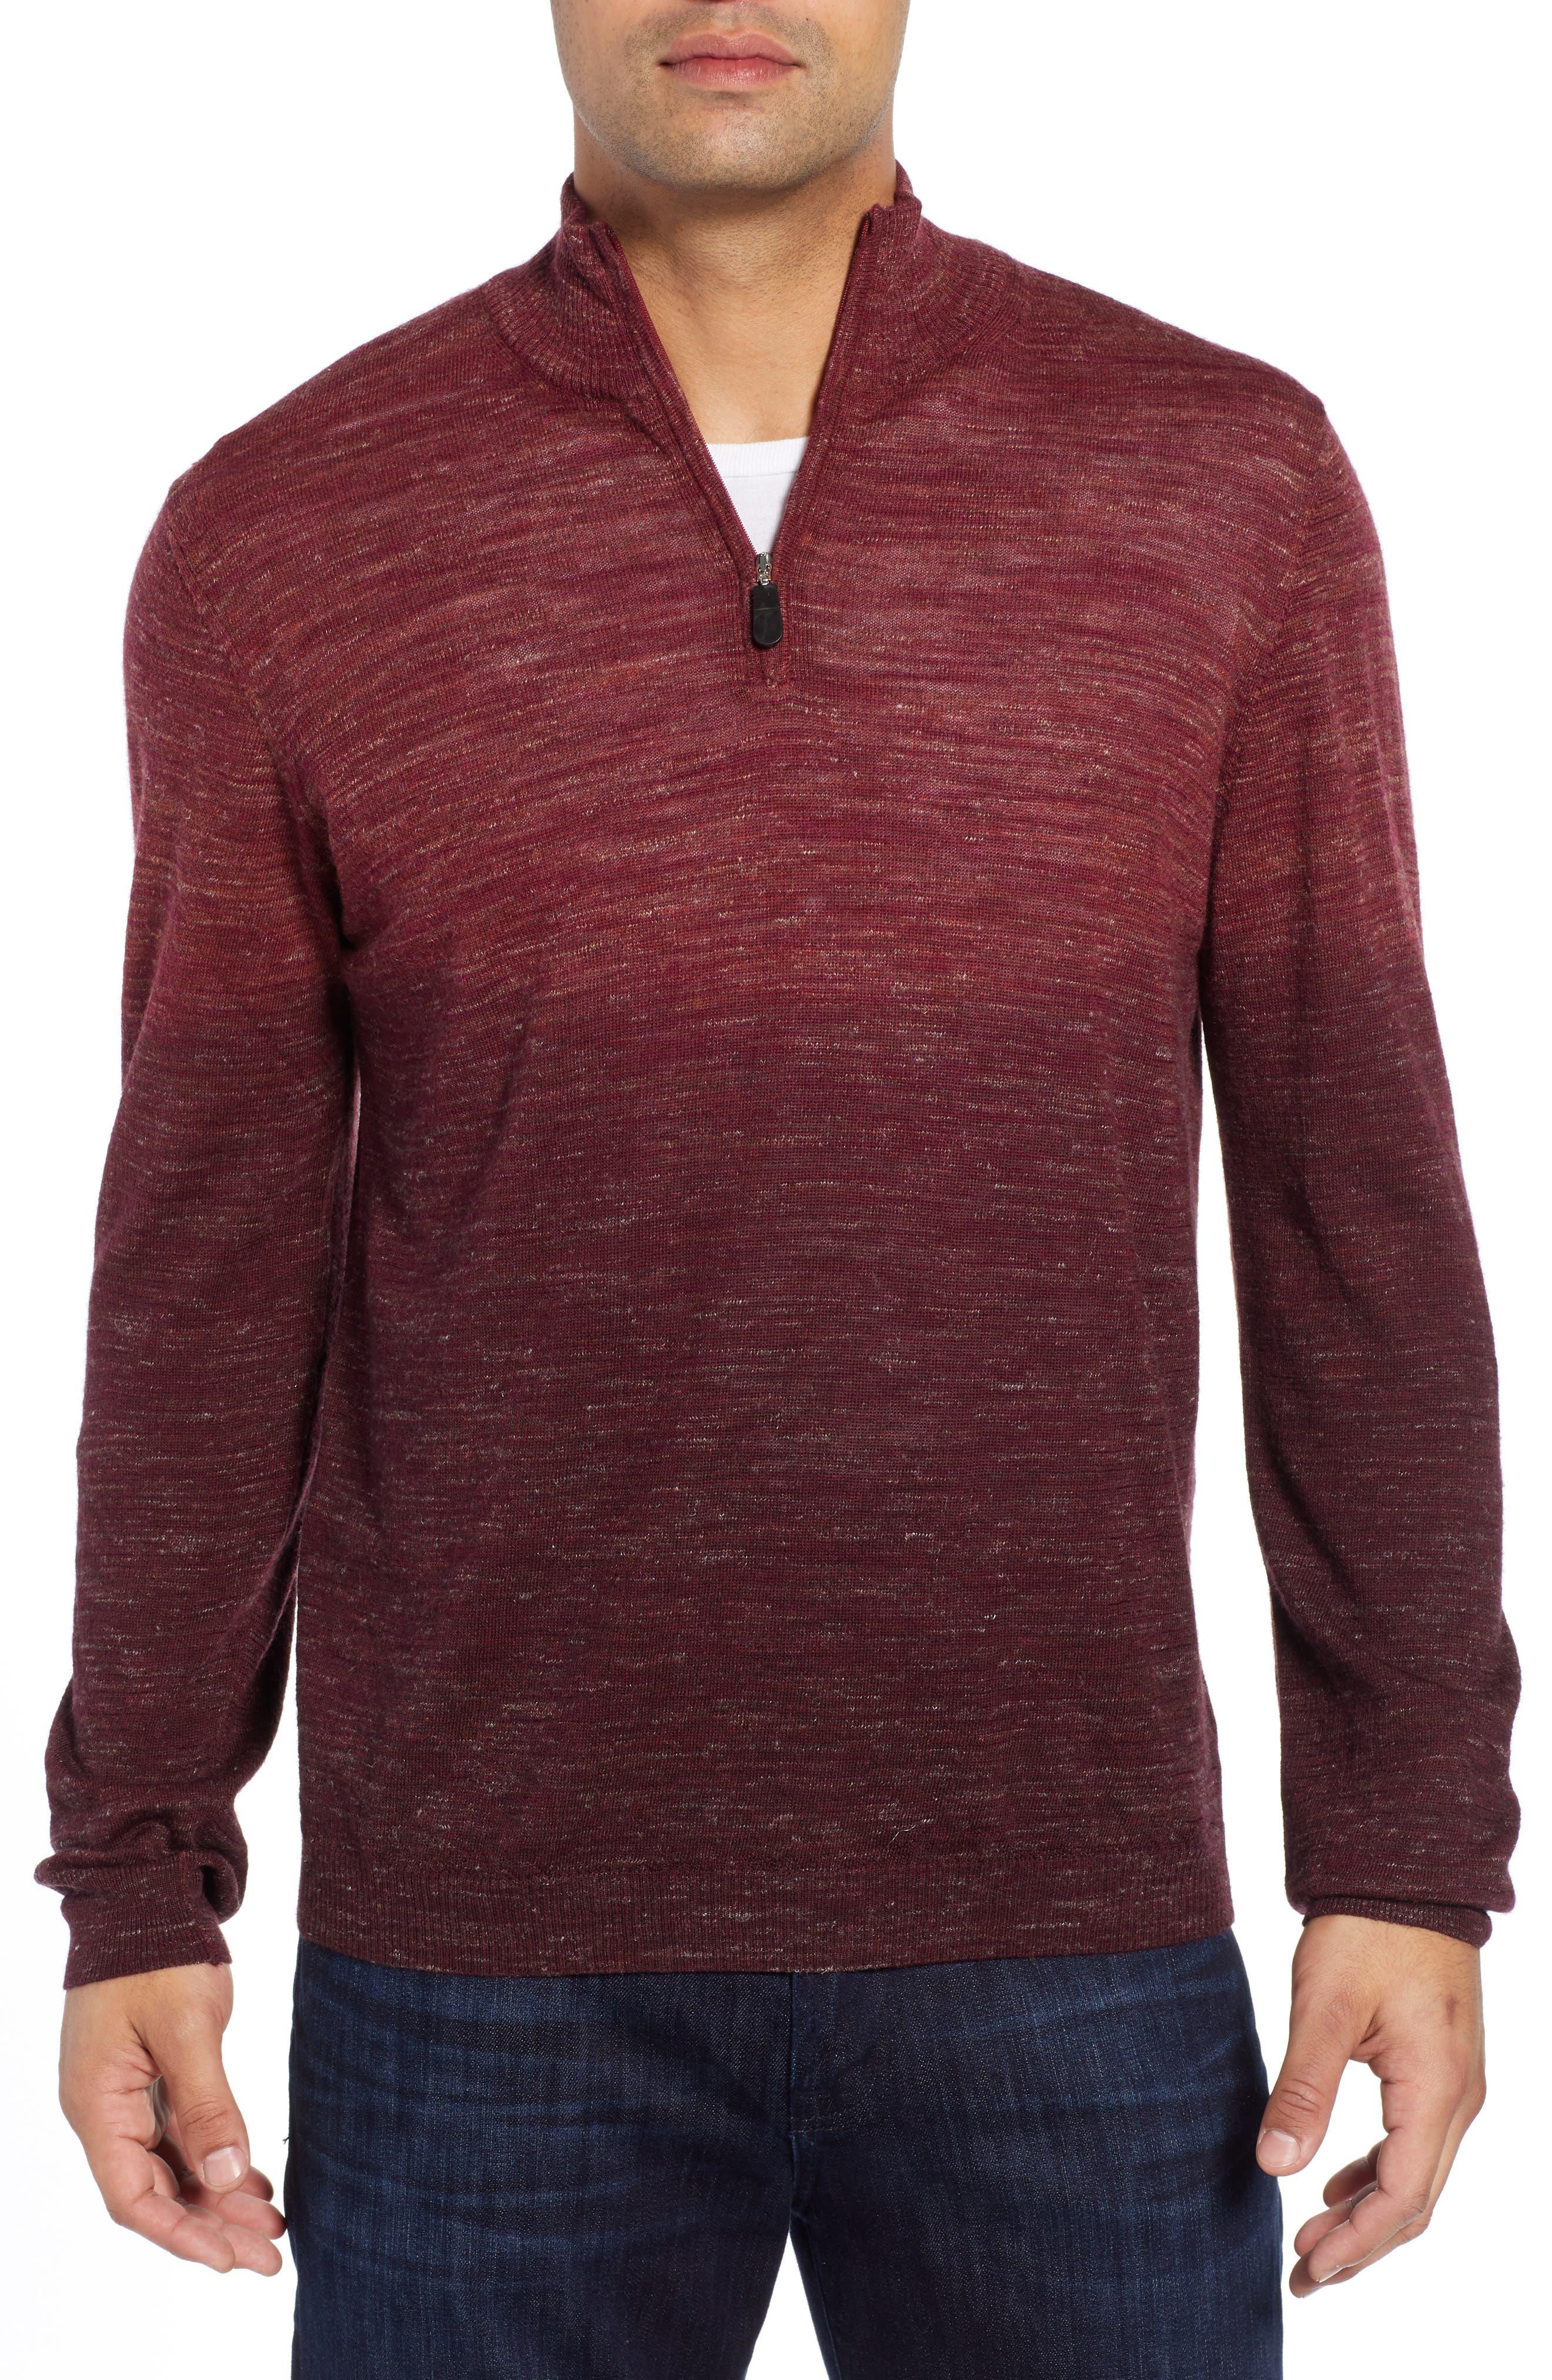 Quarter Zip Pullover,                             Main thumbnail 1, color,                             WINE